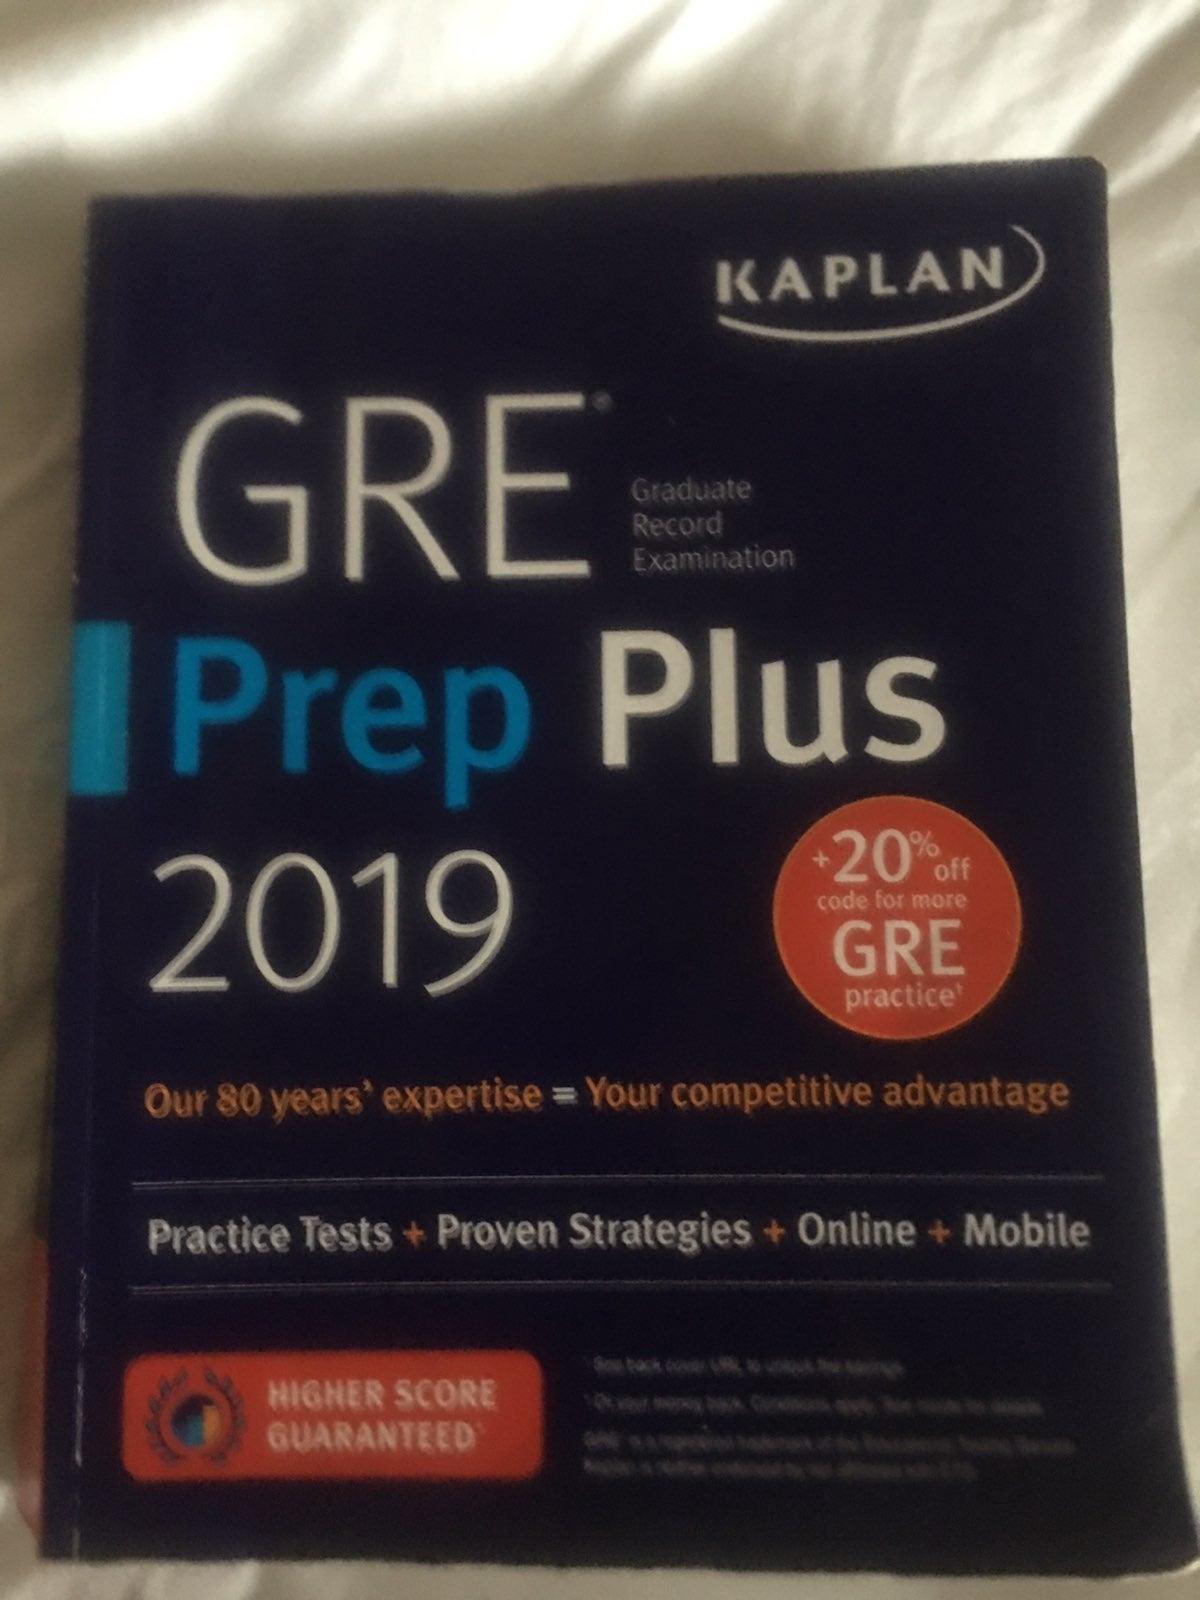 GRE PREP plus 2019 edition